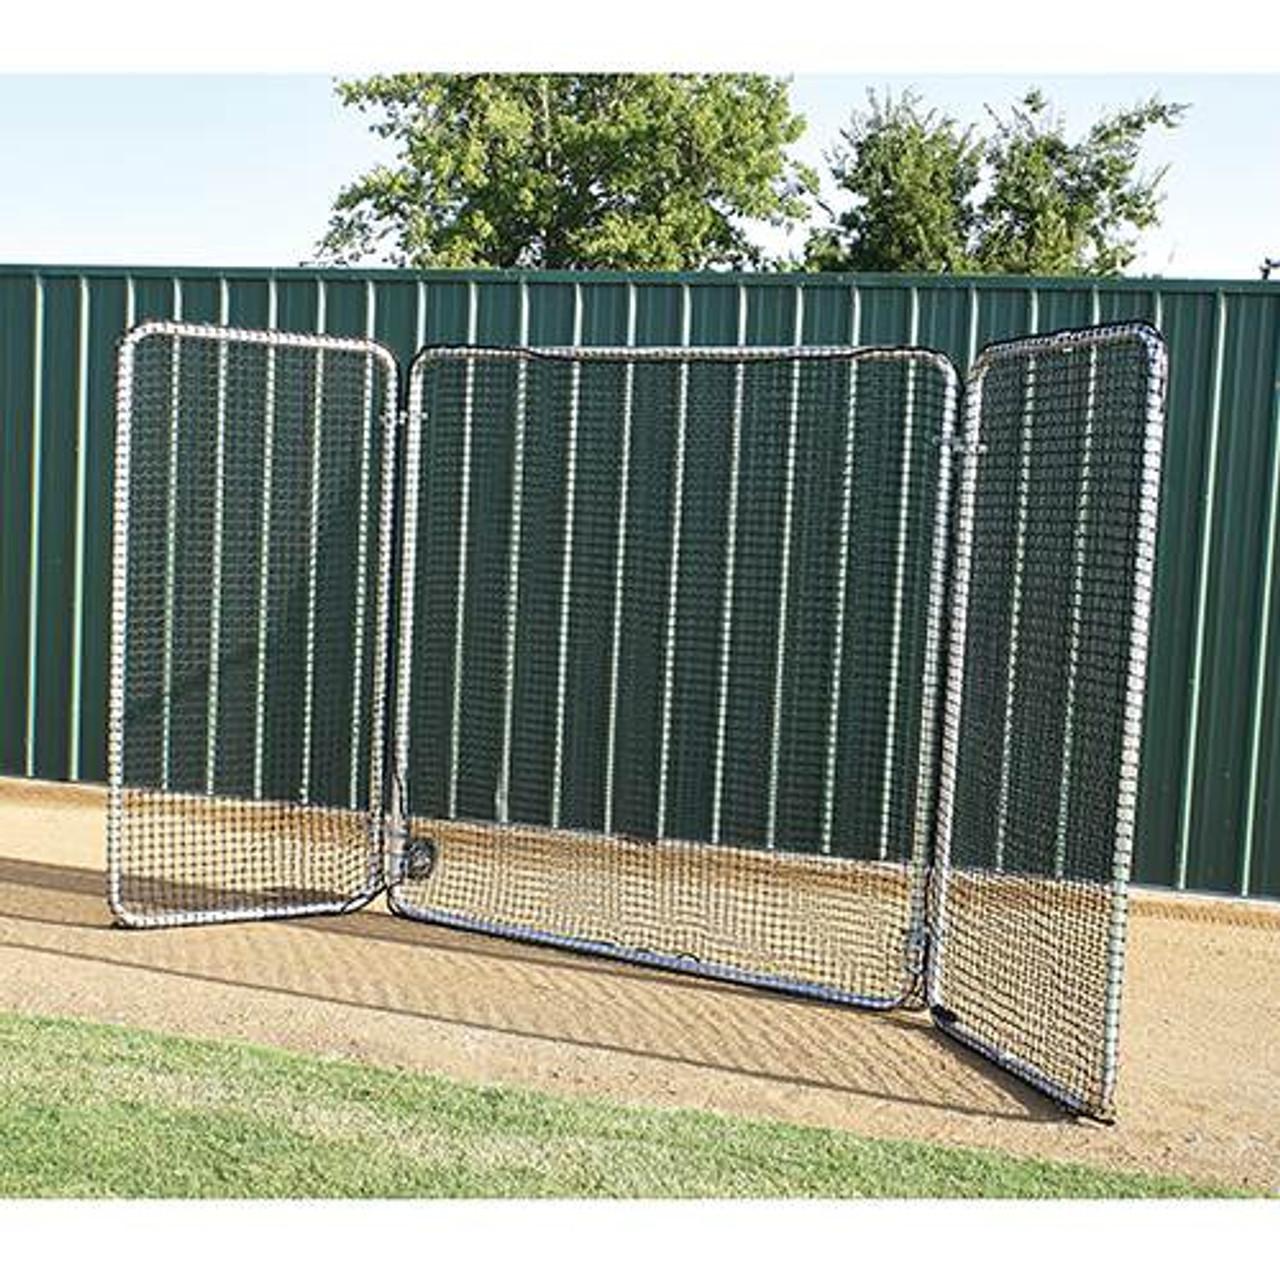 Baseball Protector Tri-Fold Screen 8' x 16'